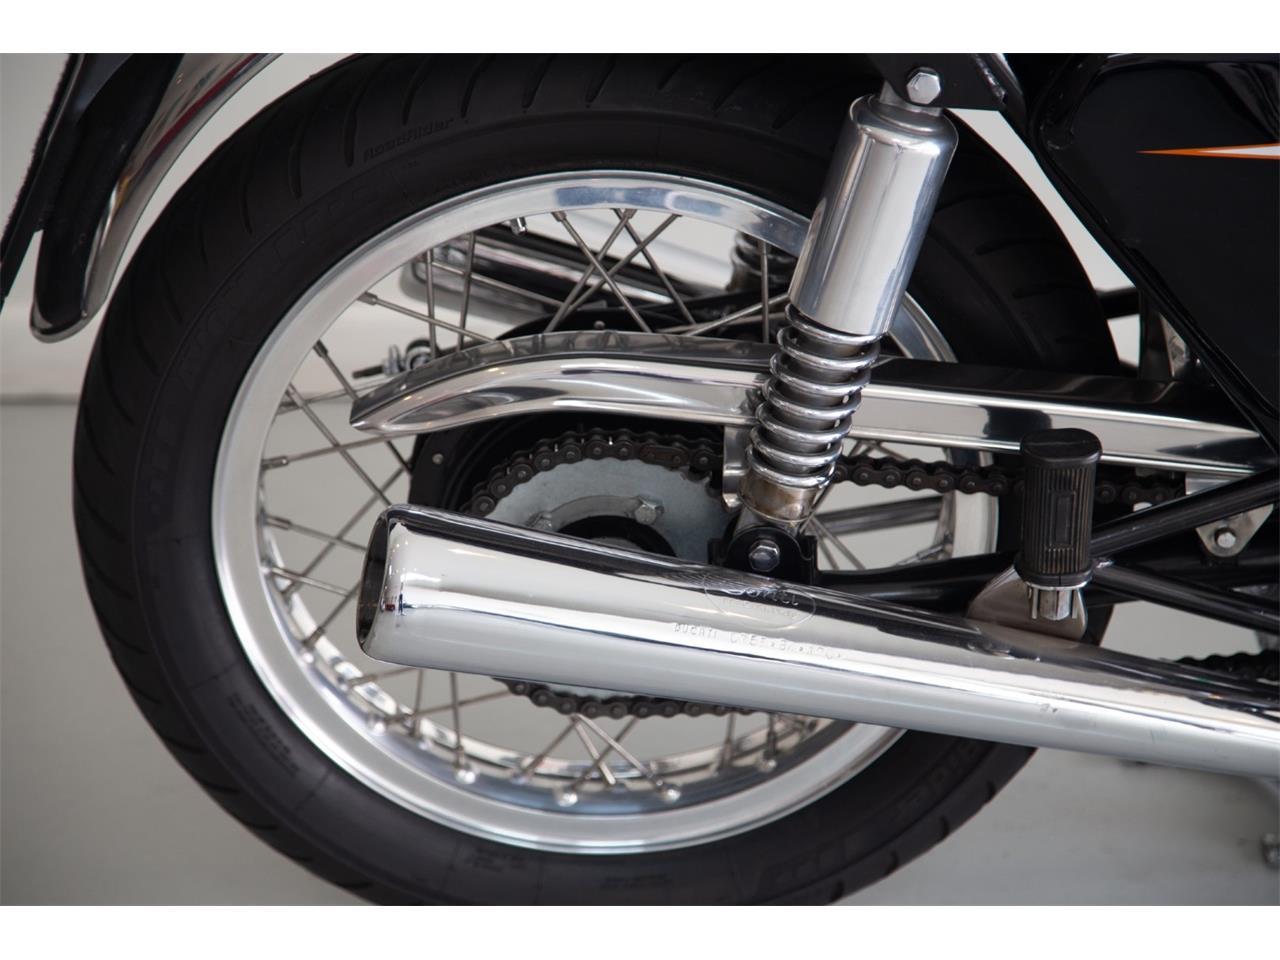 1974 Ducati Motorcycle (CC-1387029) for sale in La Jolla, California